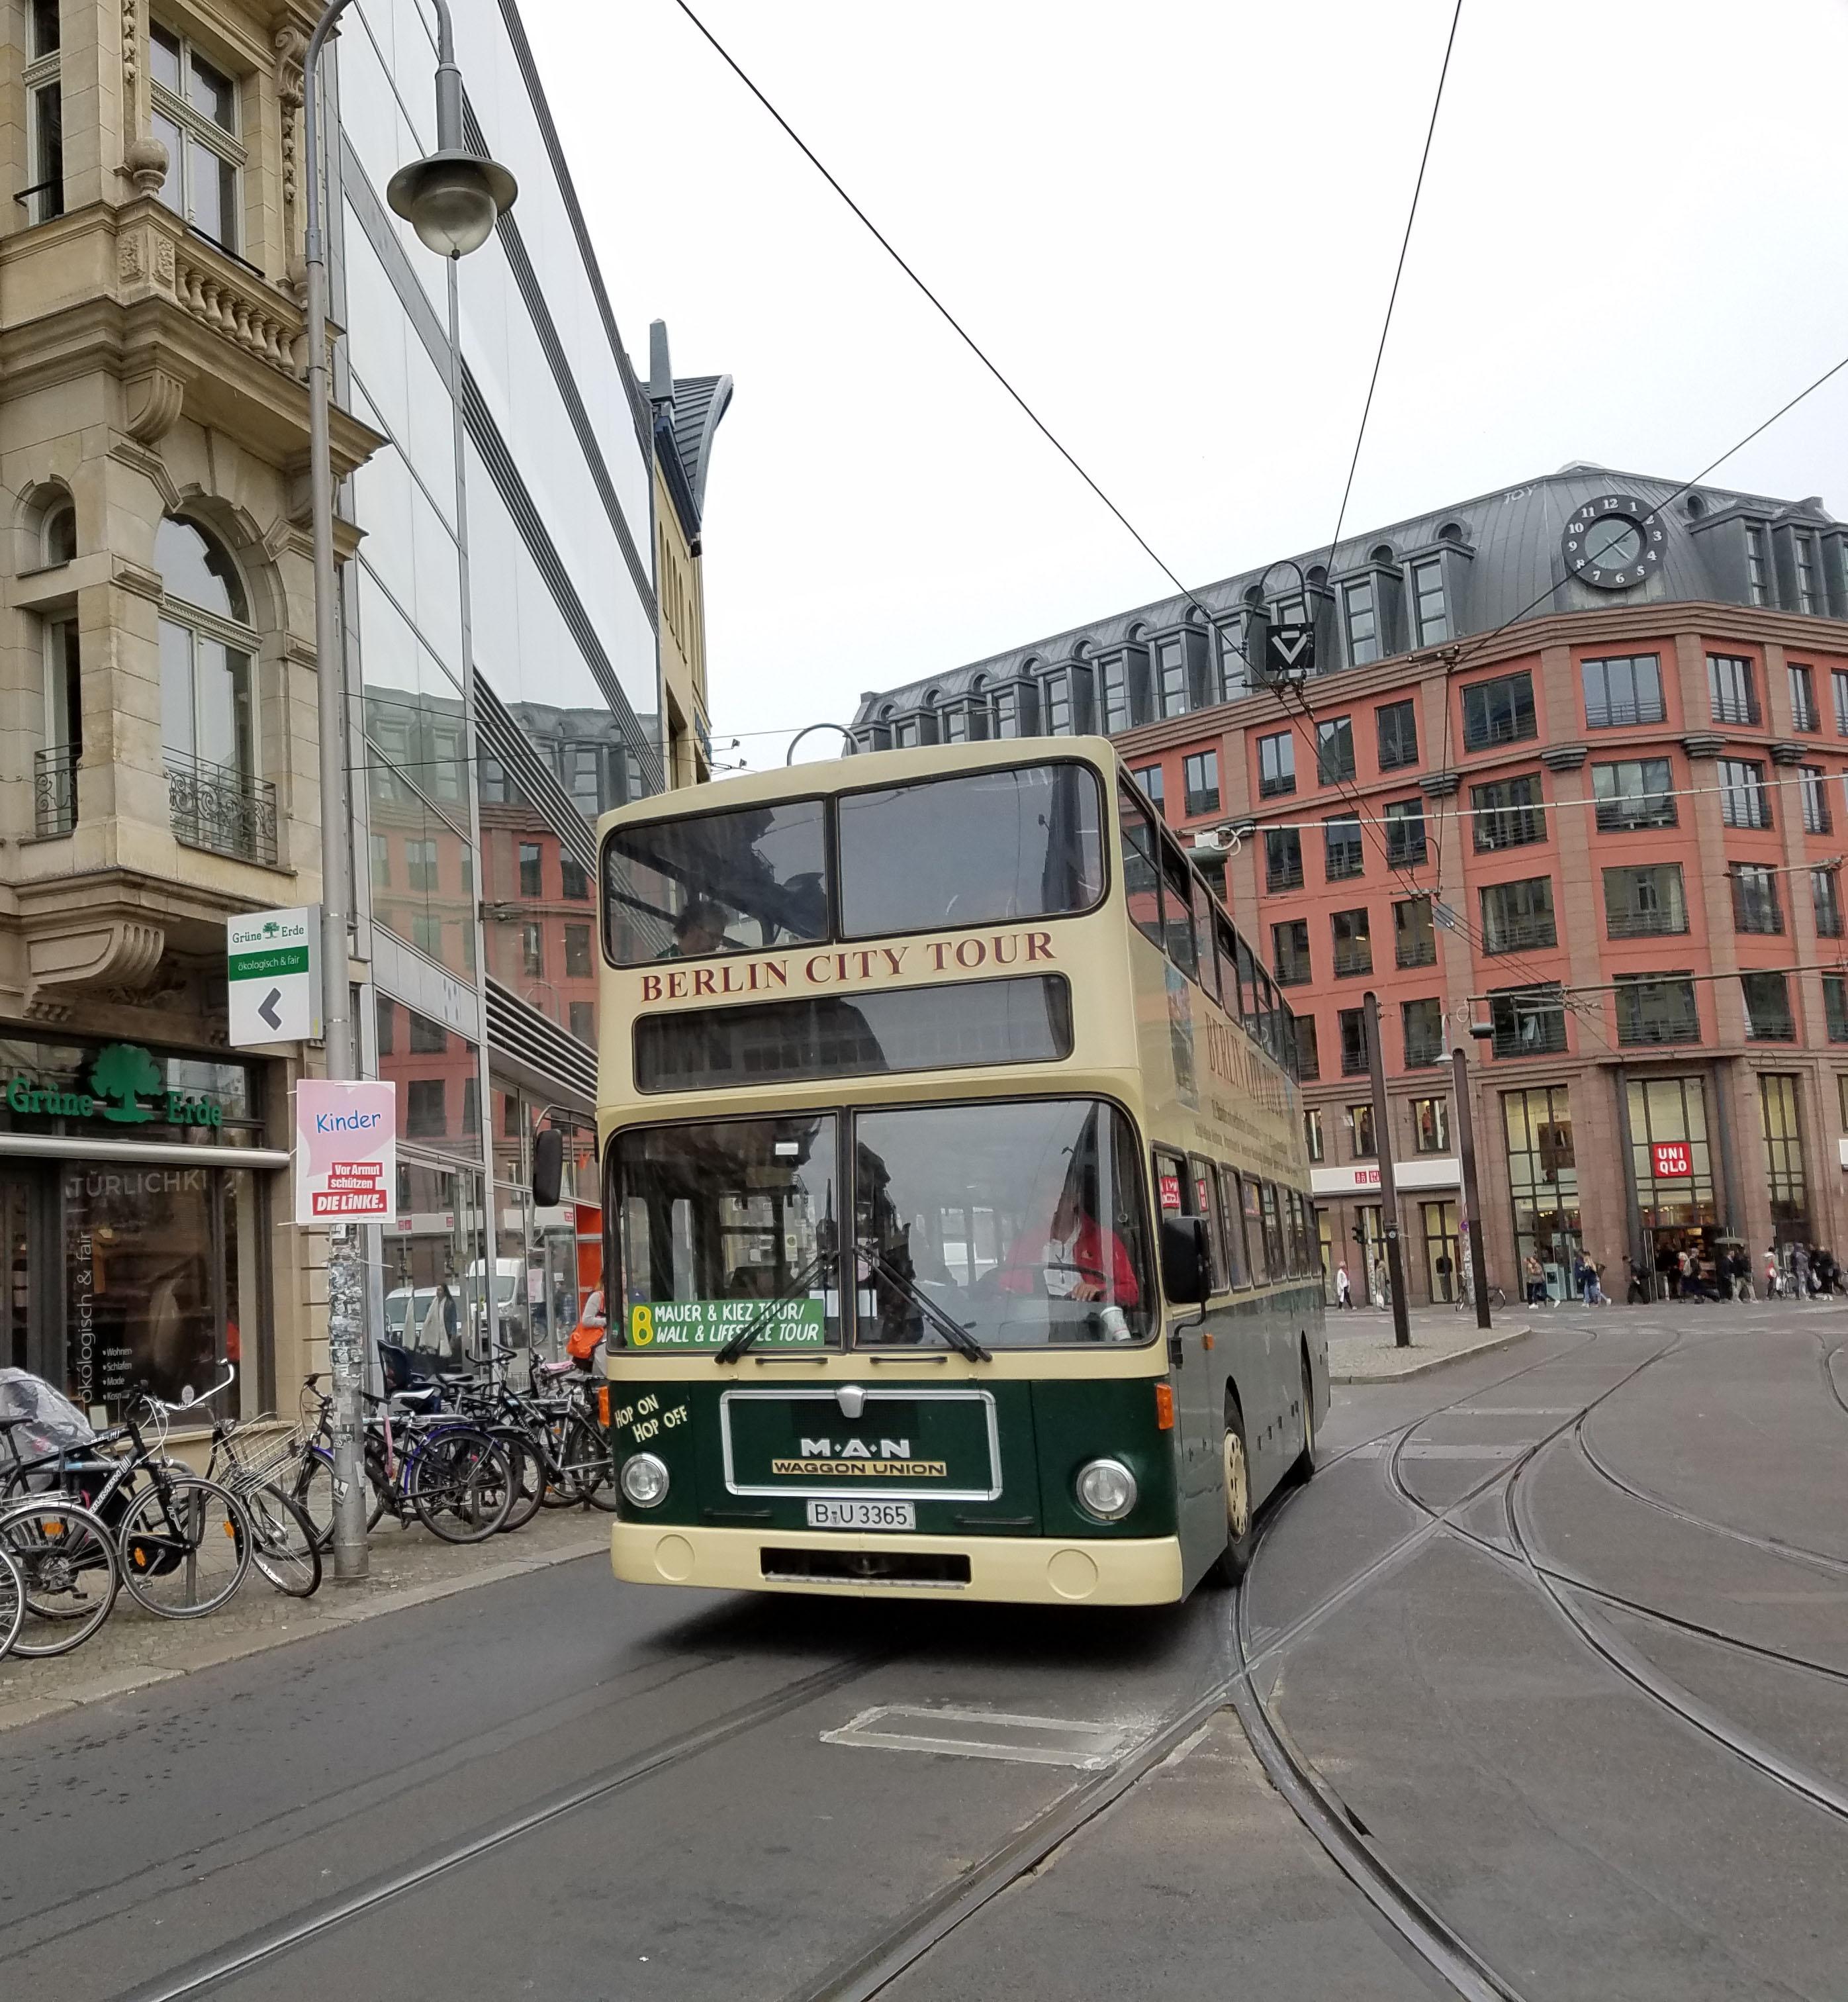 Foto: Bus 3365, Typ SD84, Stadtrundfahrtbus B U 3365, Berlin, September 2017